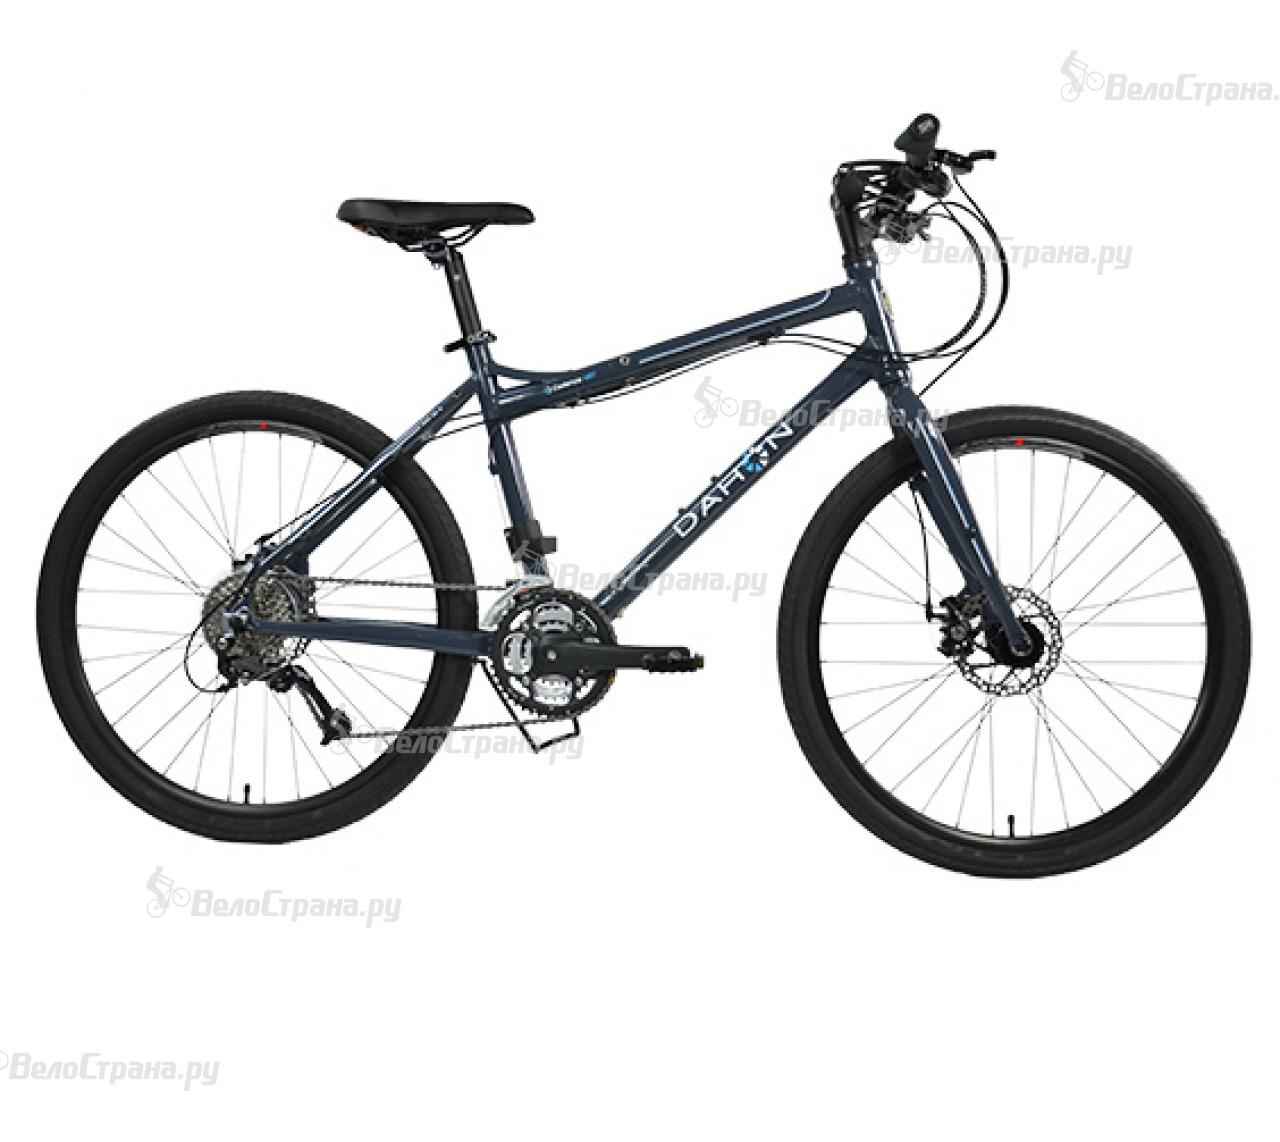 Велосипед Dahon Cadenza D27 (2017) велосипед dahon speed d7 2015